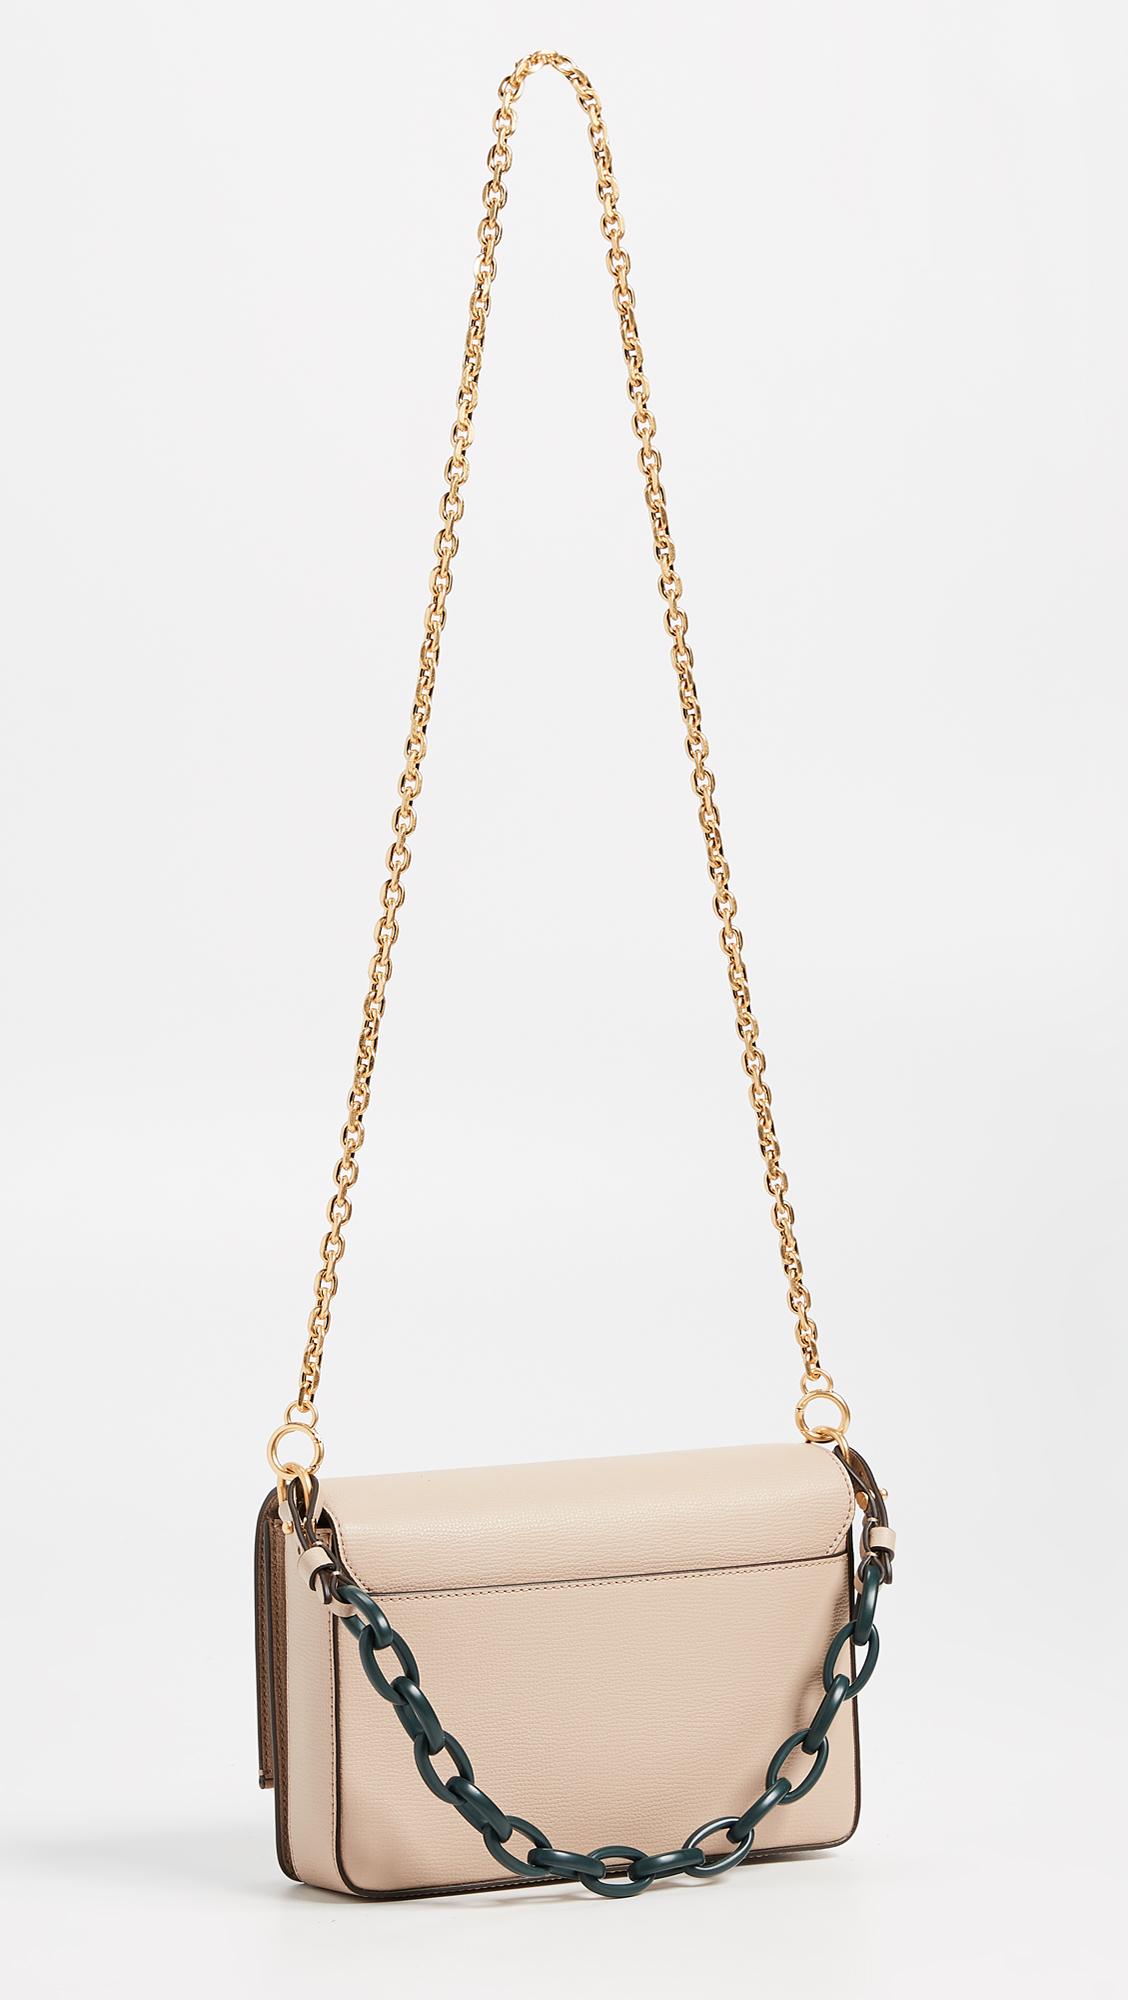 74e32090602 Tory Burch Kira Double Strap Shoulder Bag   SHOPBOP